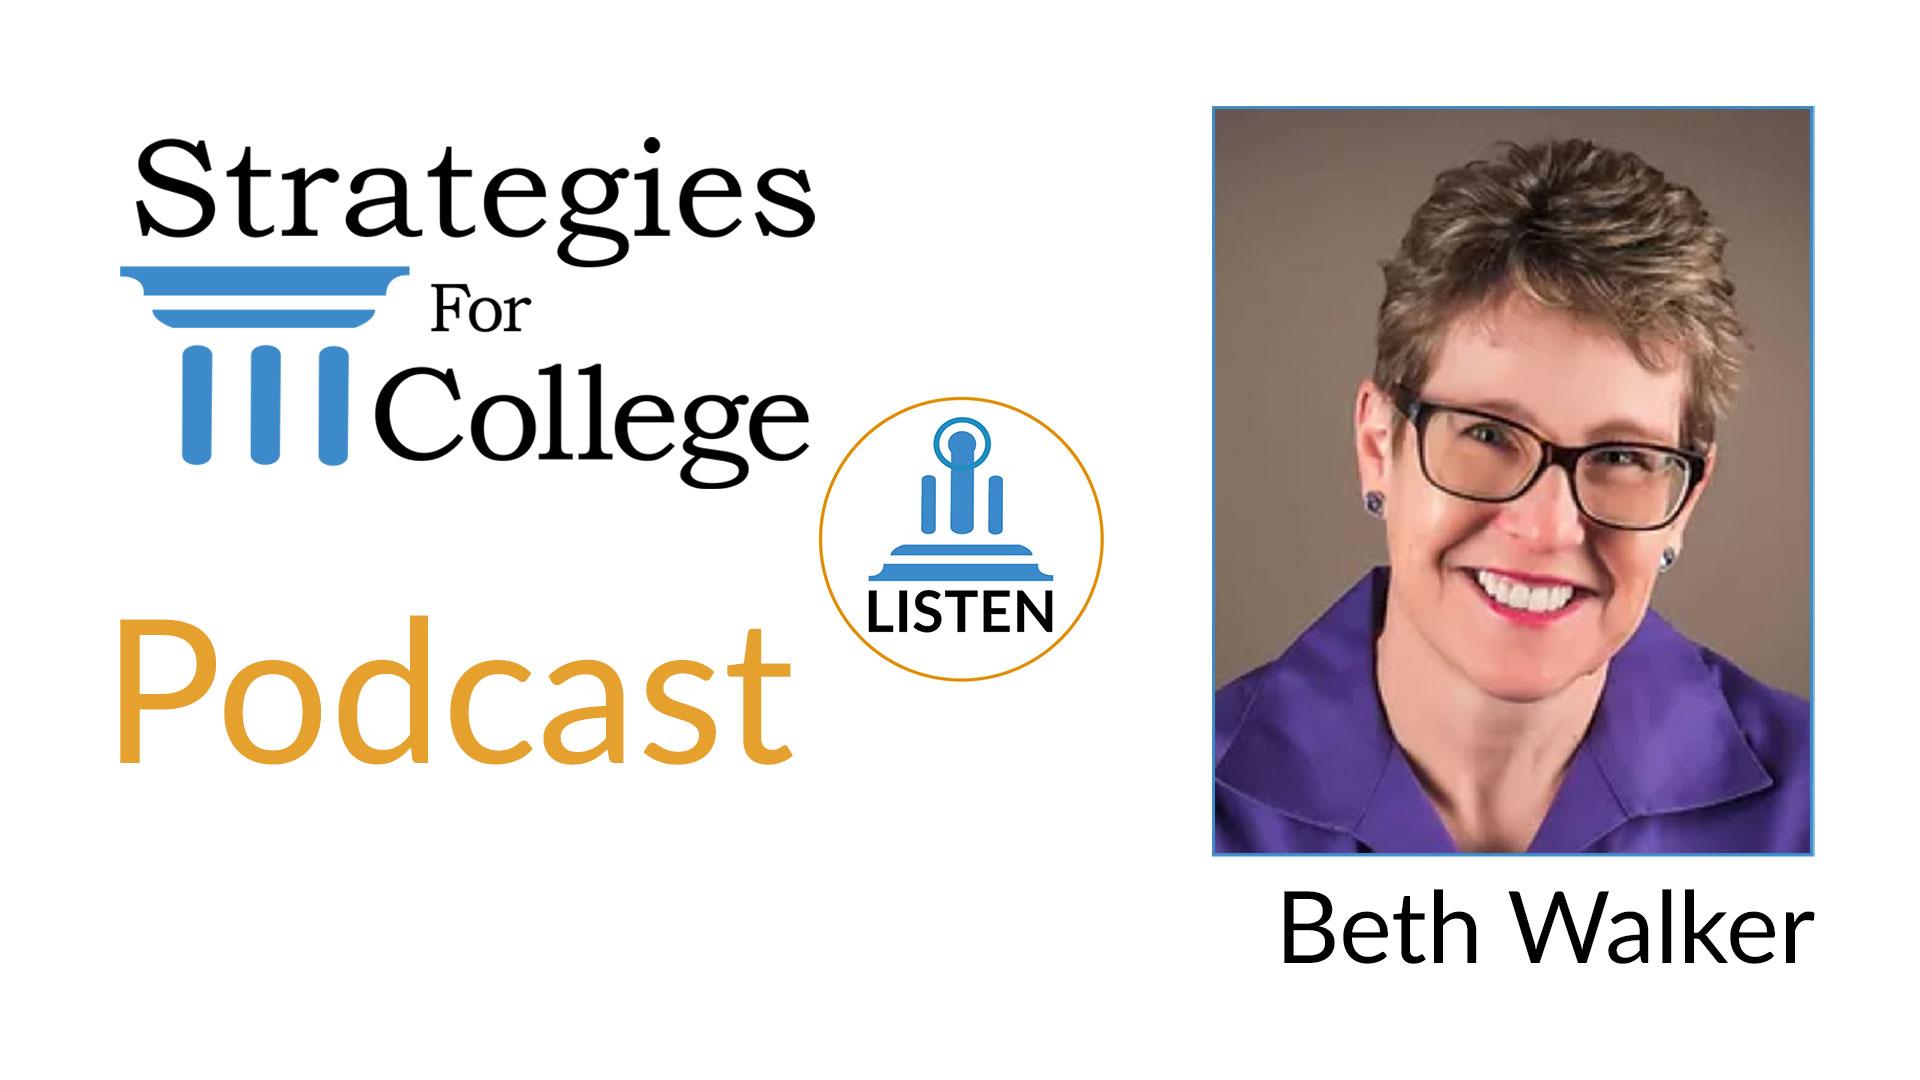 Podcast: Beth Walker